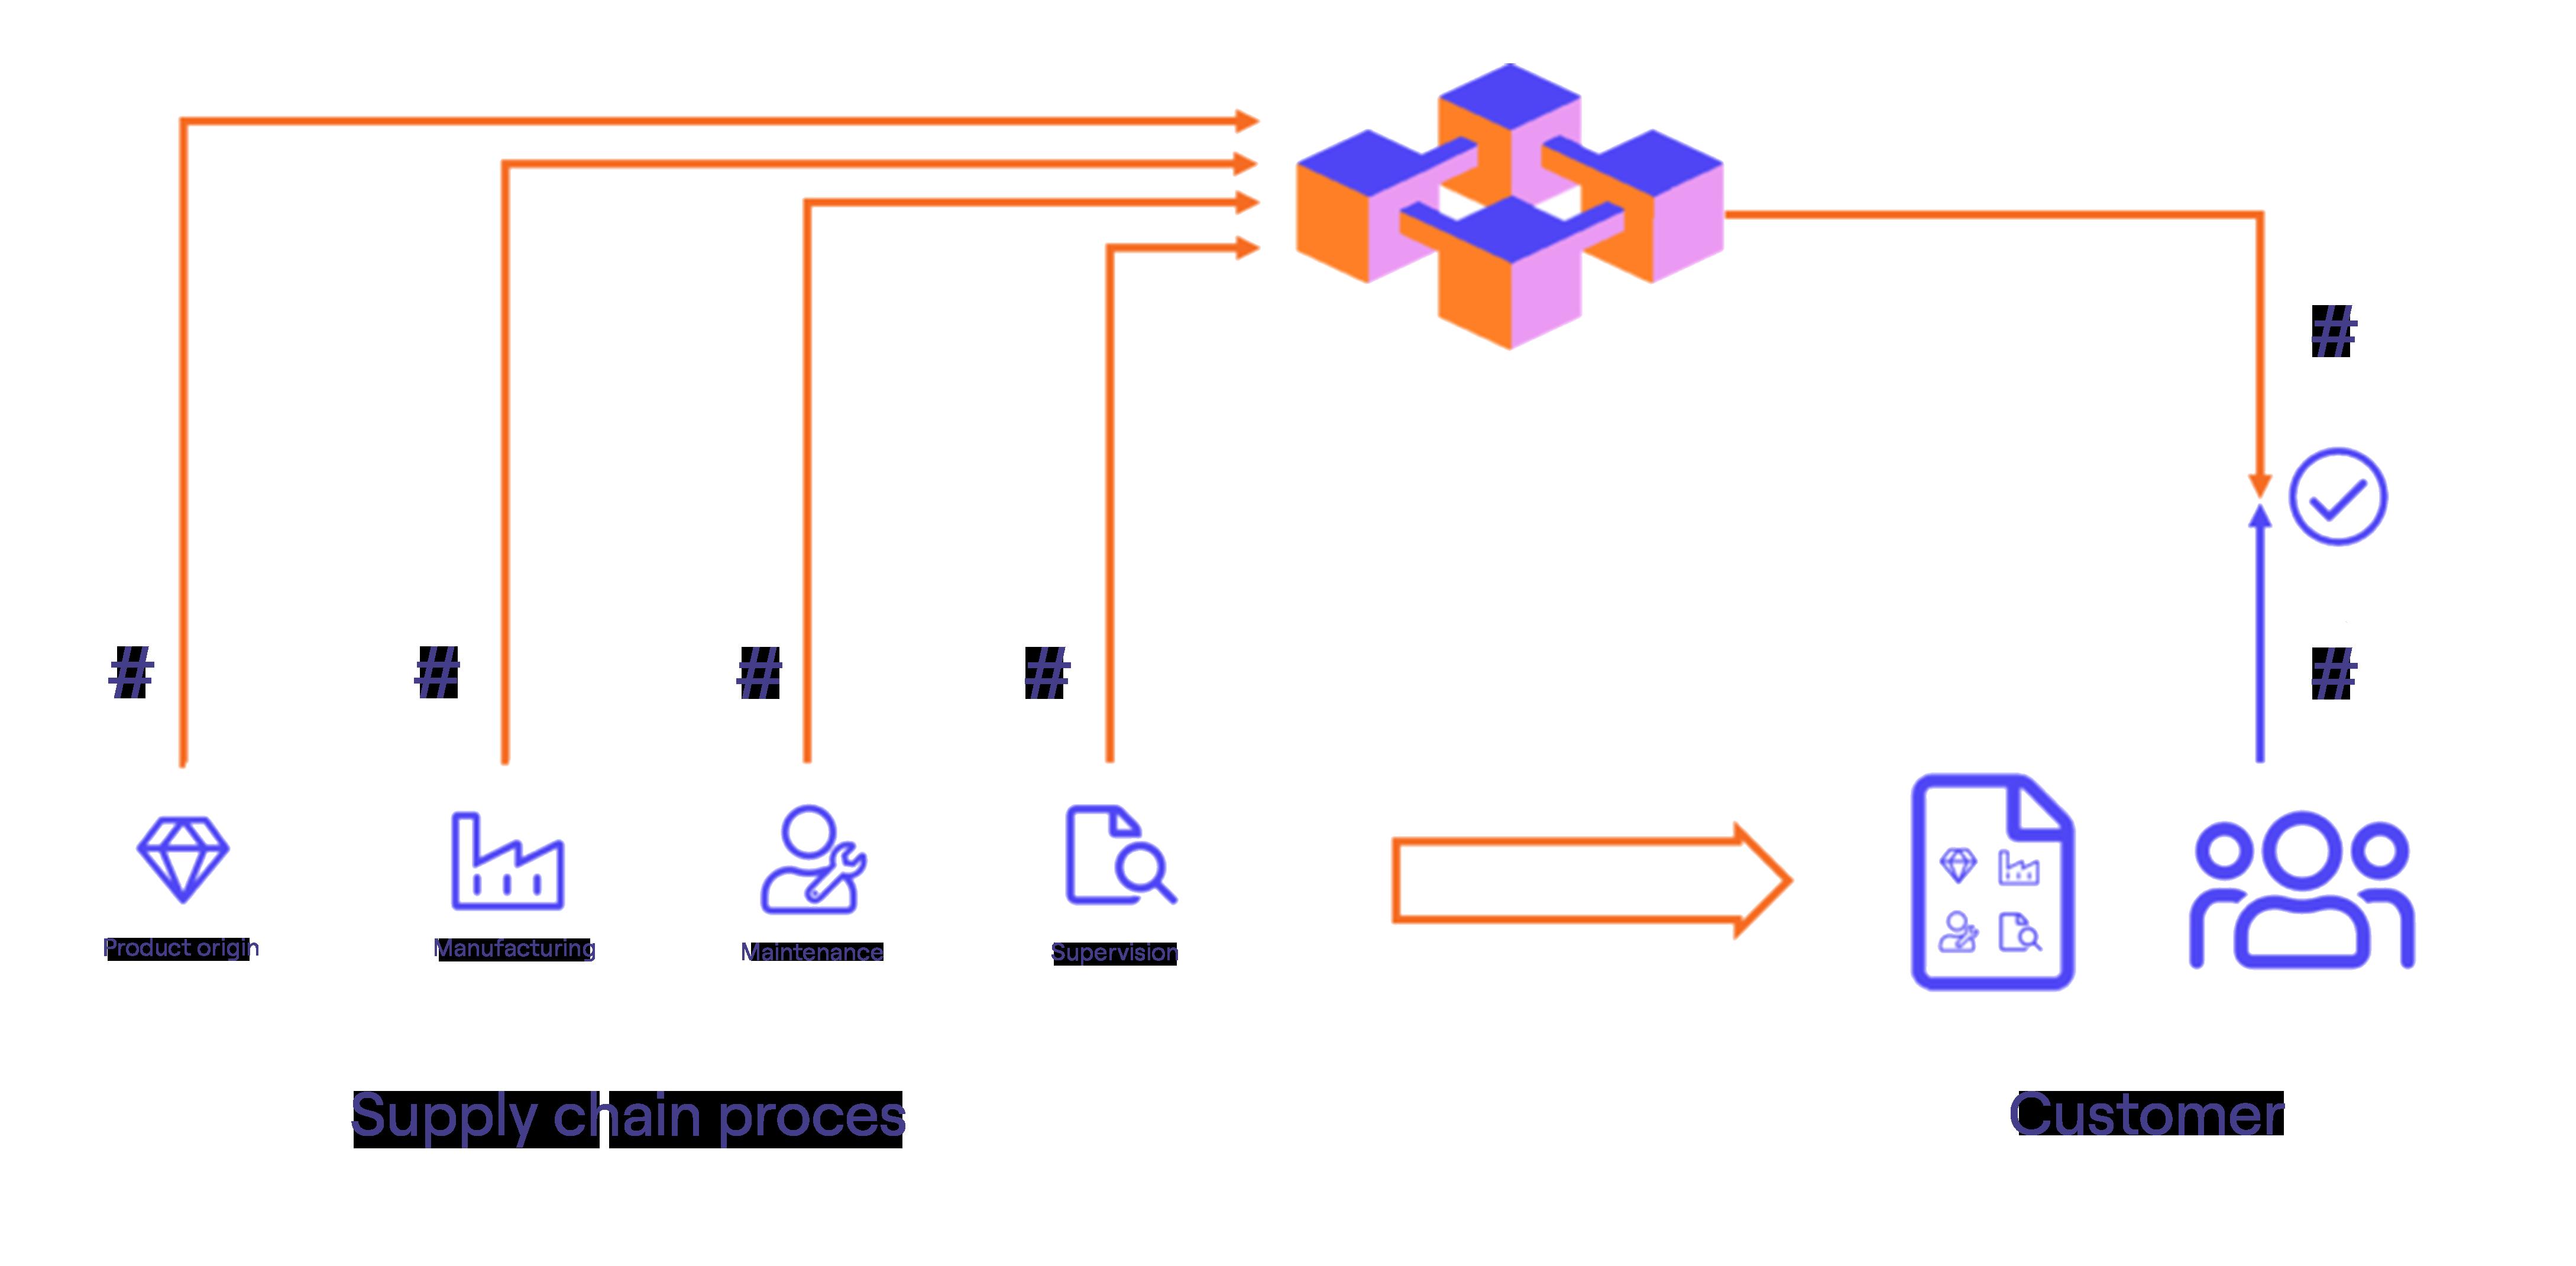 Traceability Blockchain